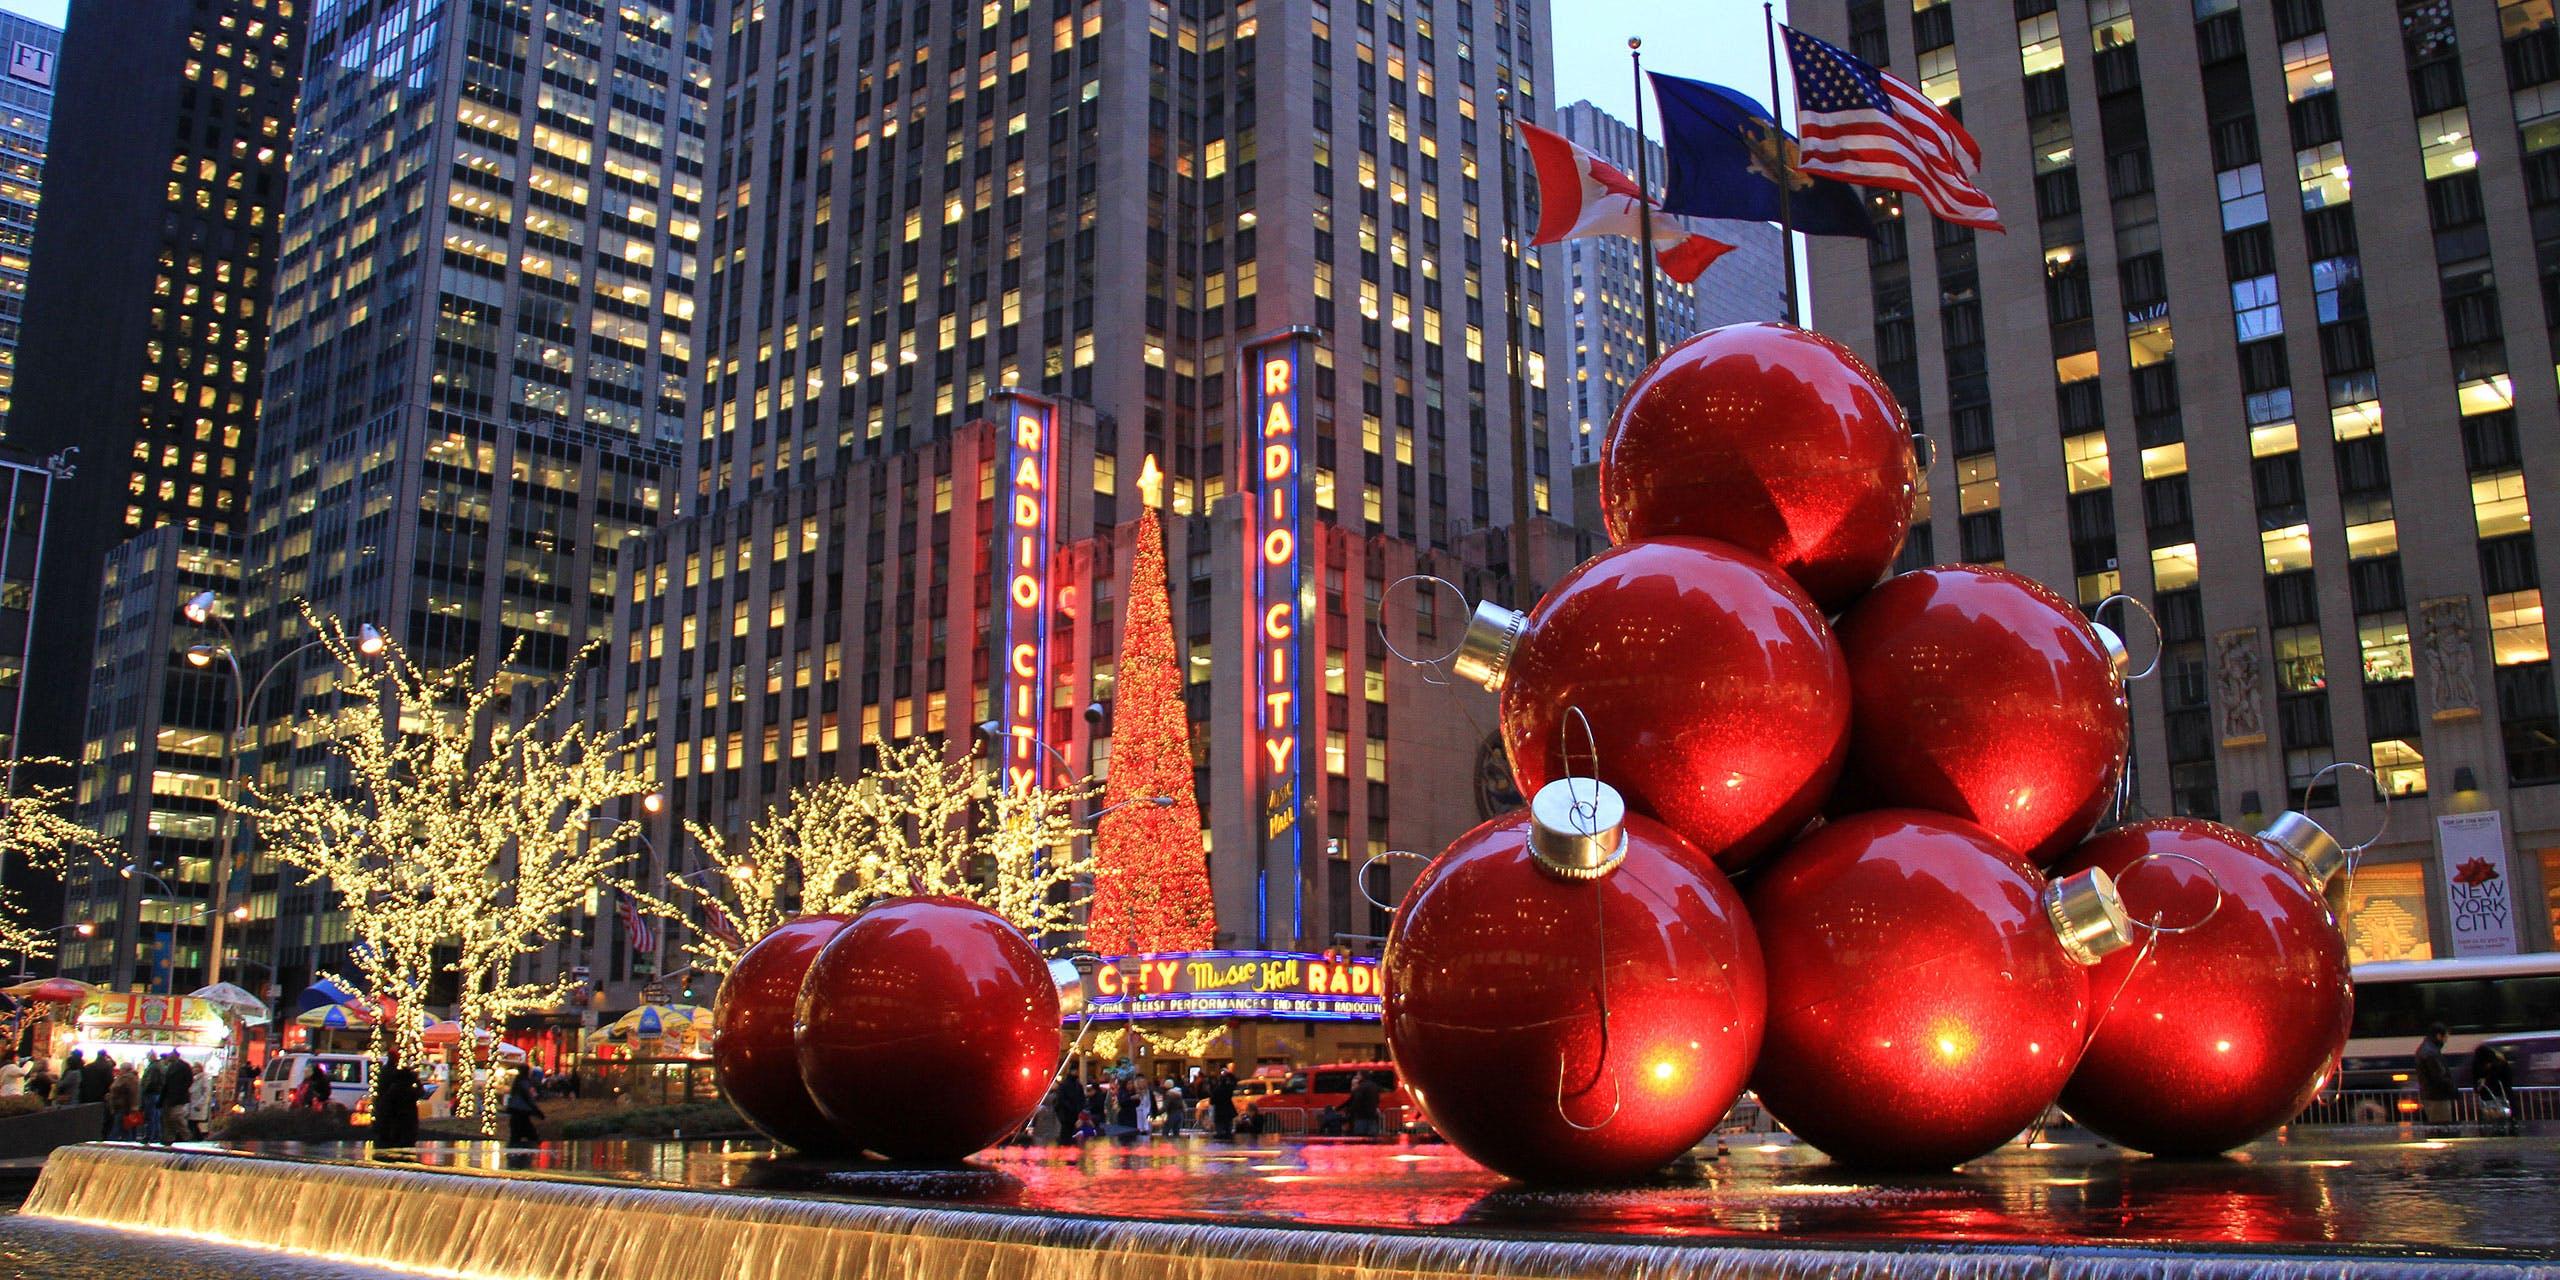 New York for holidays, Manhattan, SEEMA holidays, SEEMA network, SEEMA NYC, SEEMA for asian women, SEEMA